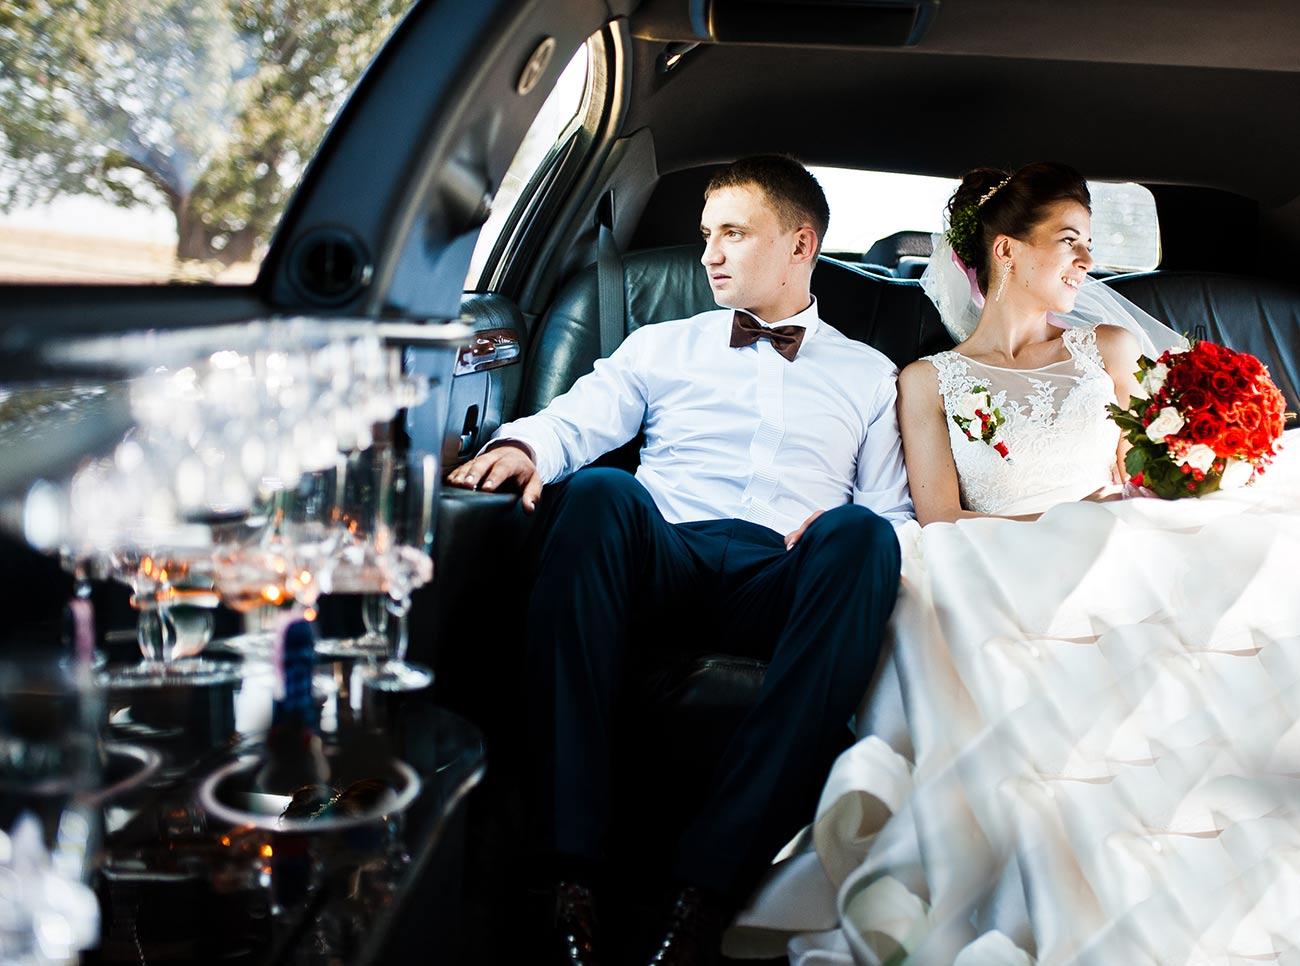 LI Top Wedding Limo Service